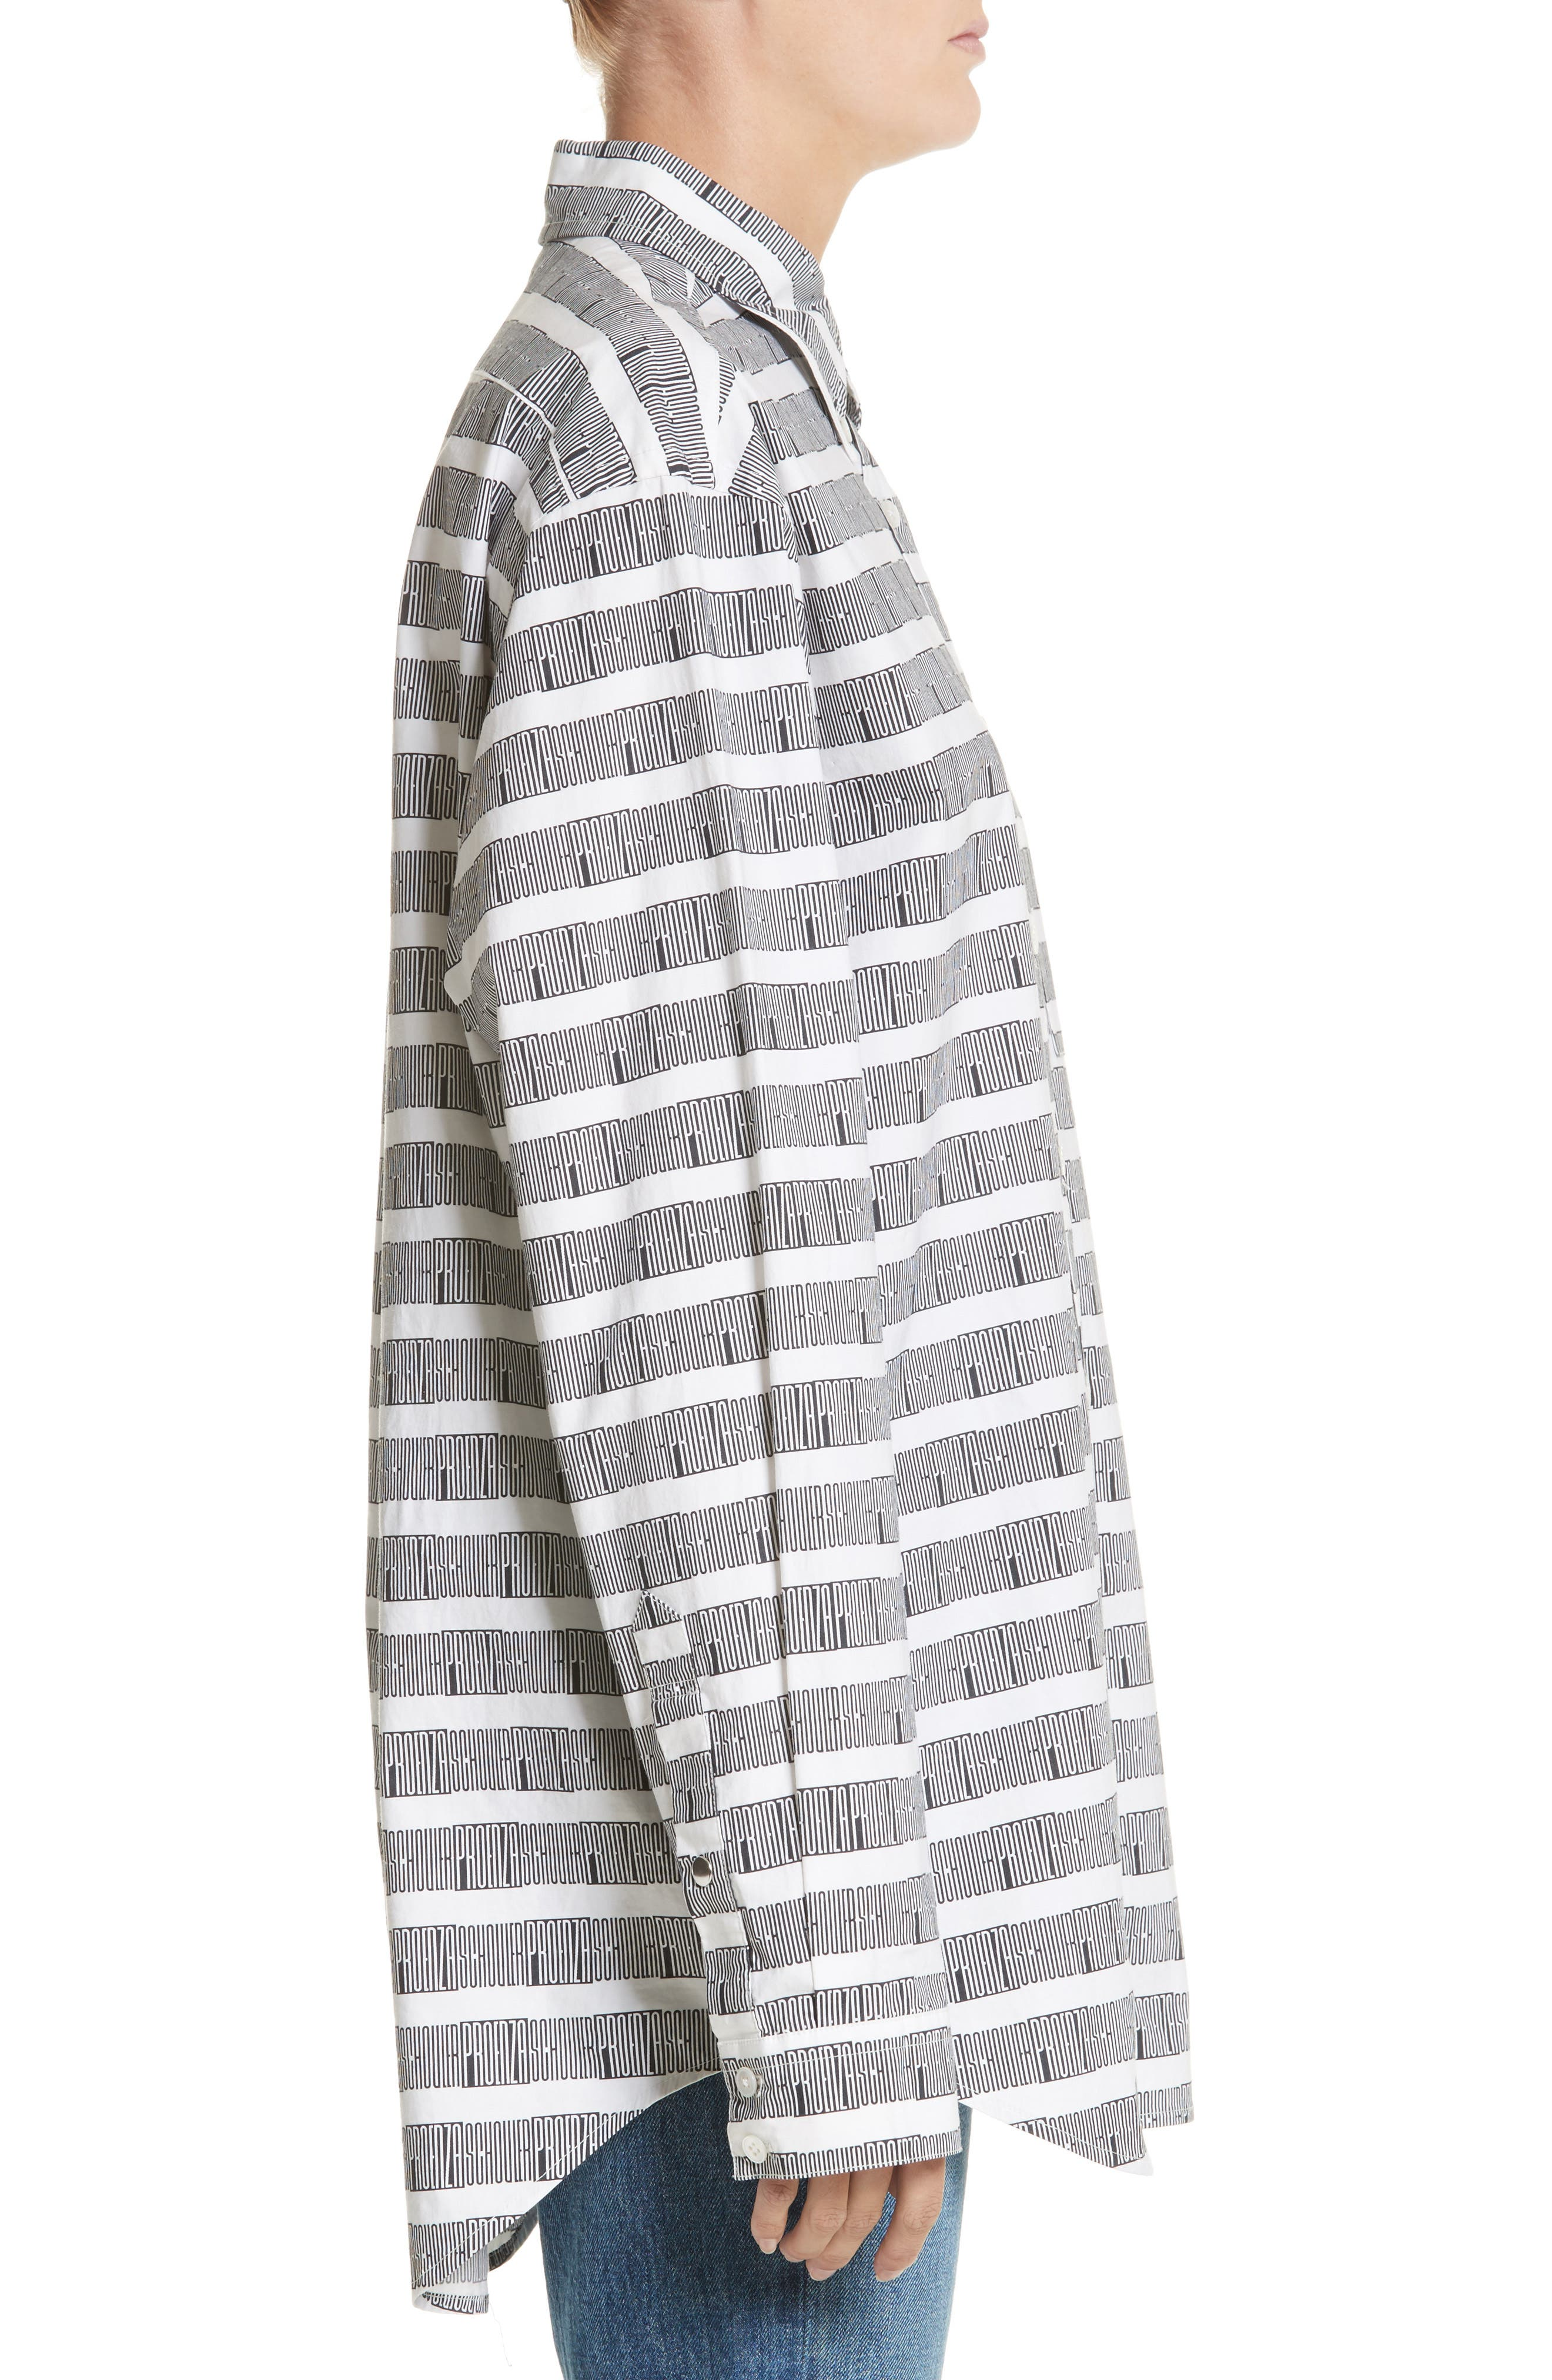 PSWL Graphic Stripe Cotton Top,                             Alternate thumbnail 3, color,                             001